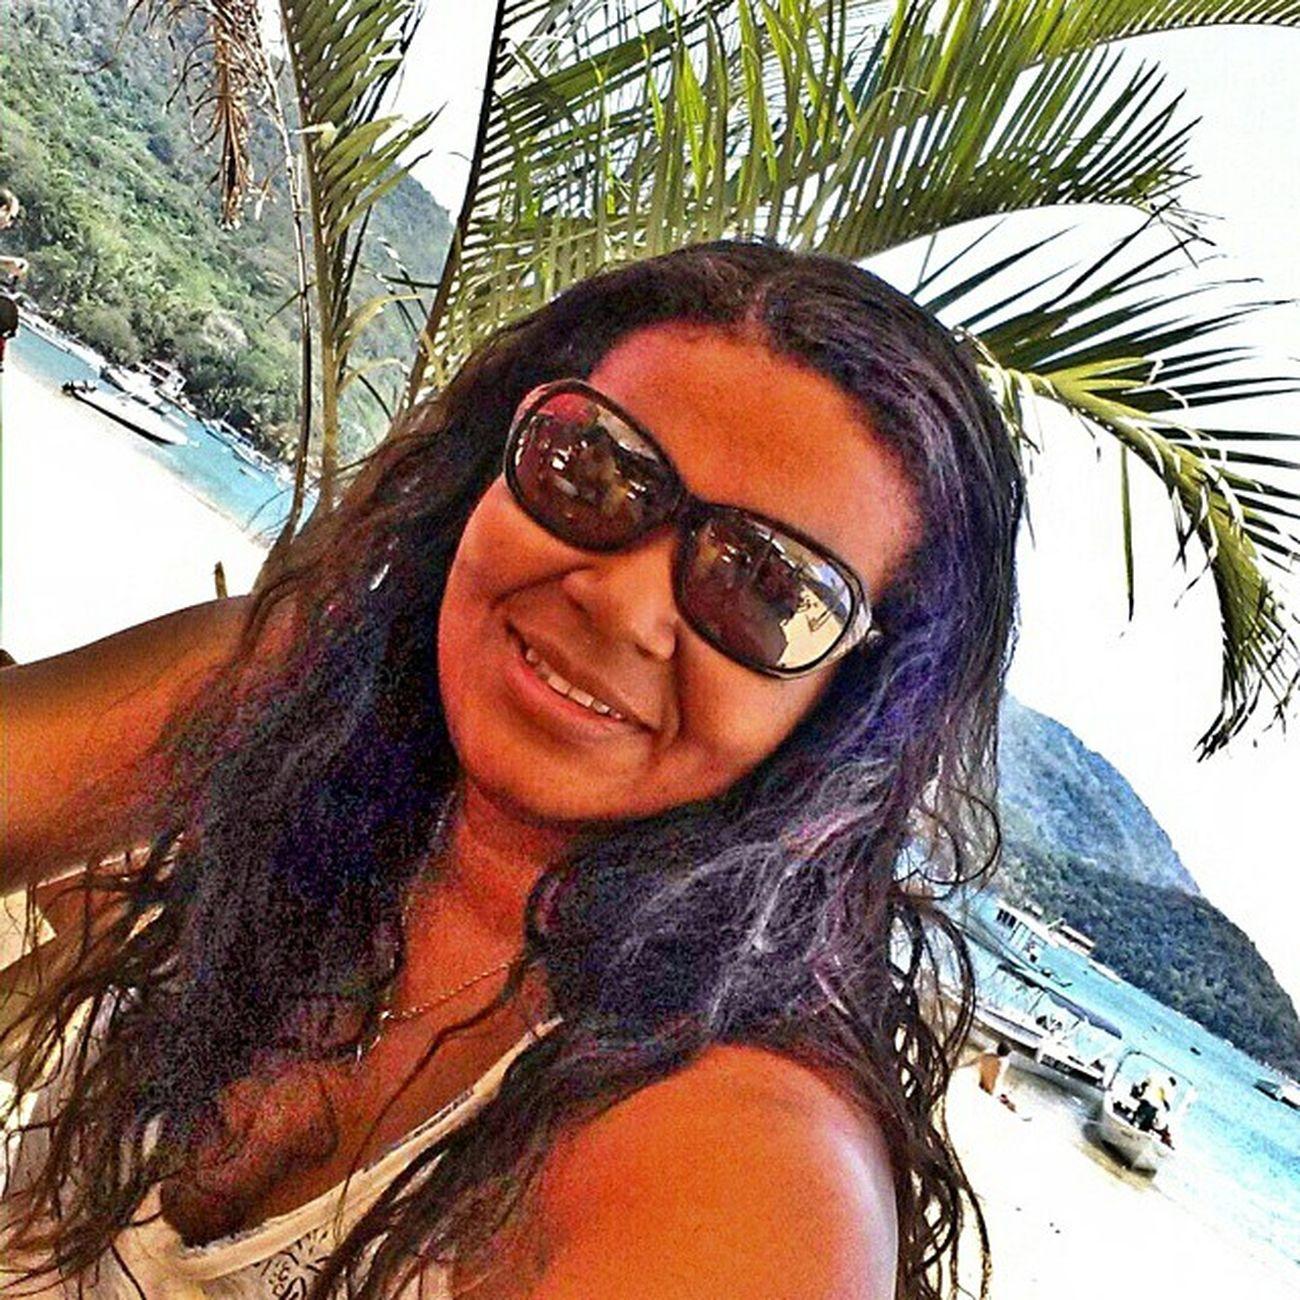 FdsDiferente AngraDosReis Ilhagrande Sun Beach VemVerao BoaTarde ??✌??